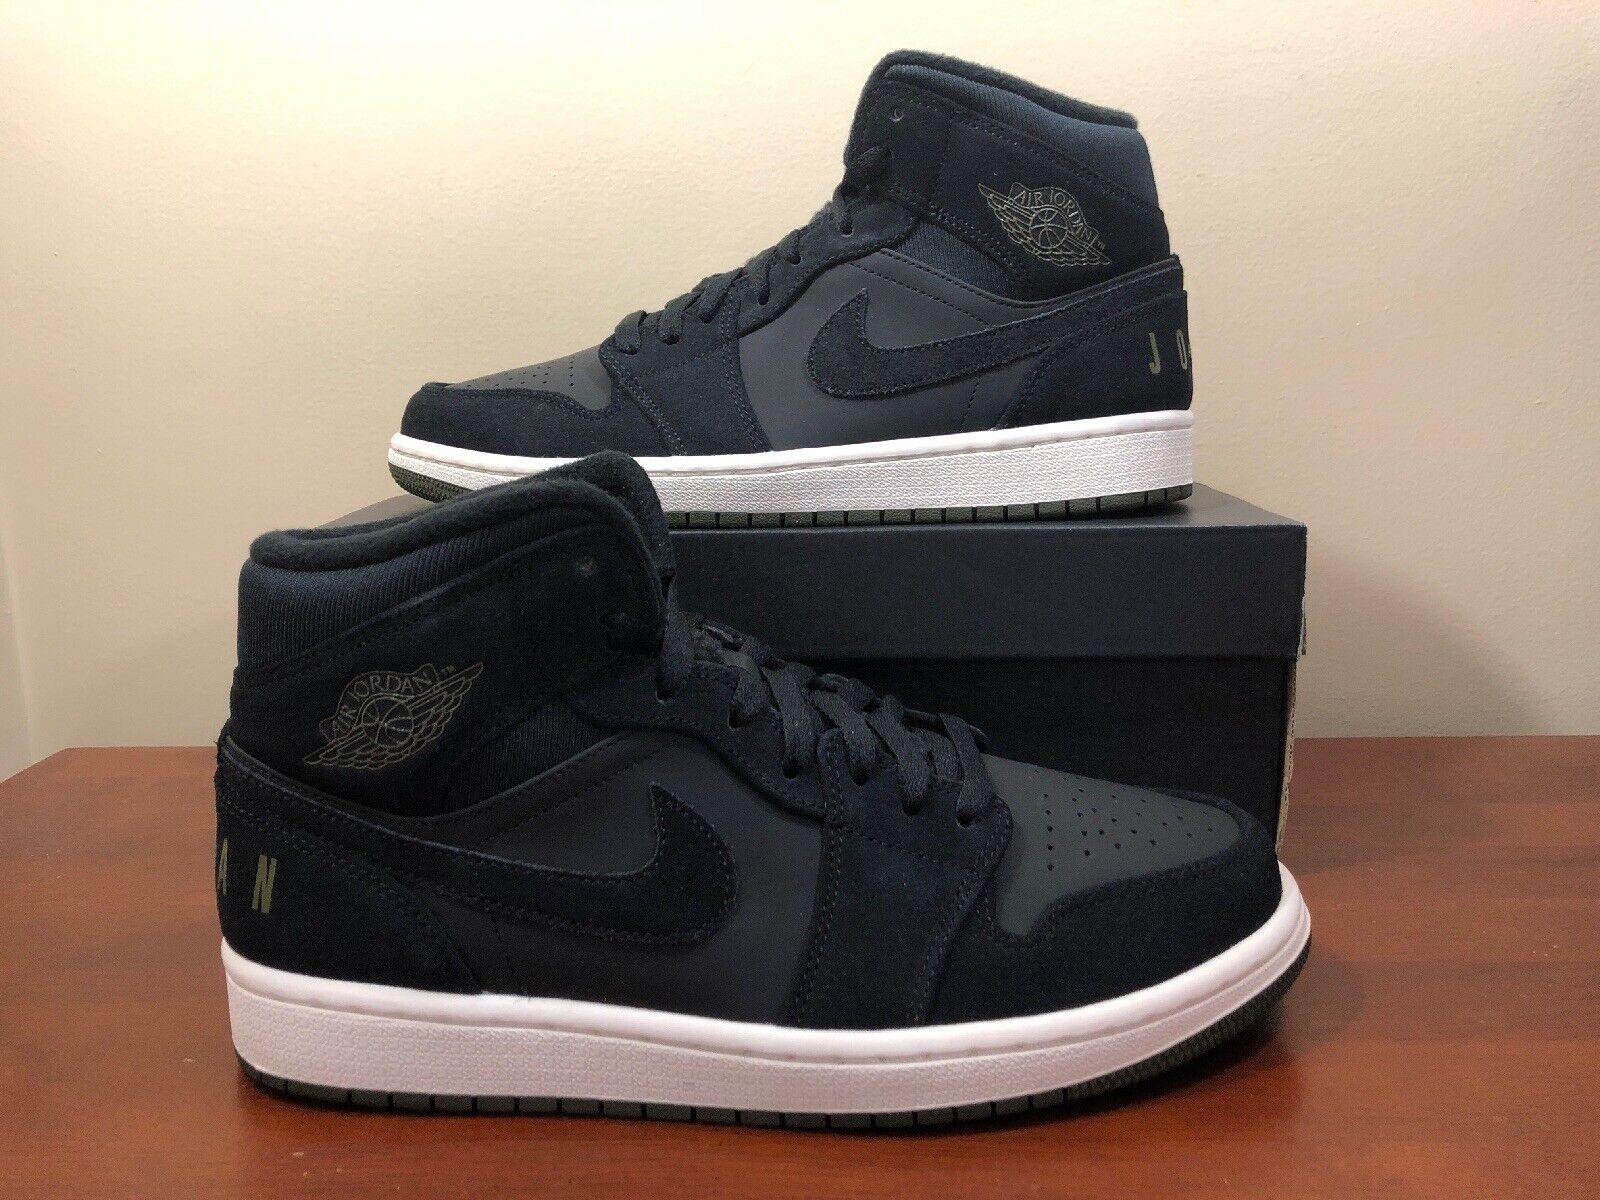 Nike Air Jordan 1 Mid Premium Black Olive Canvas Sail  BQ6579-001 Size 8.5